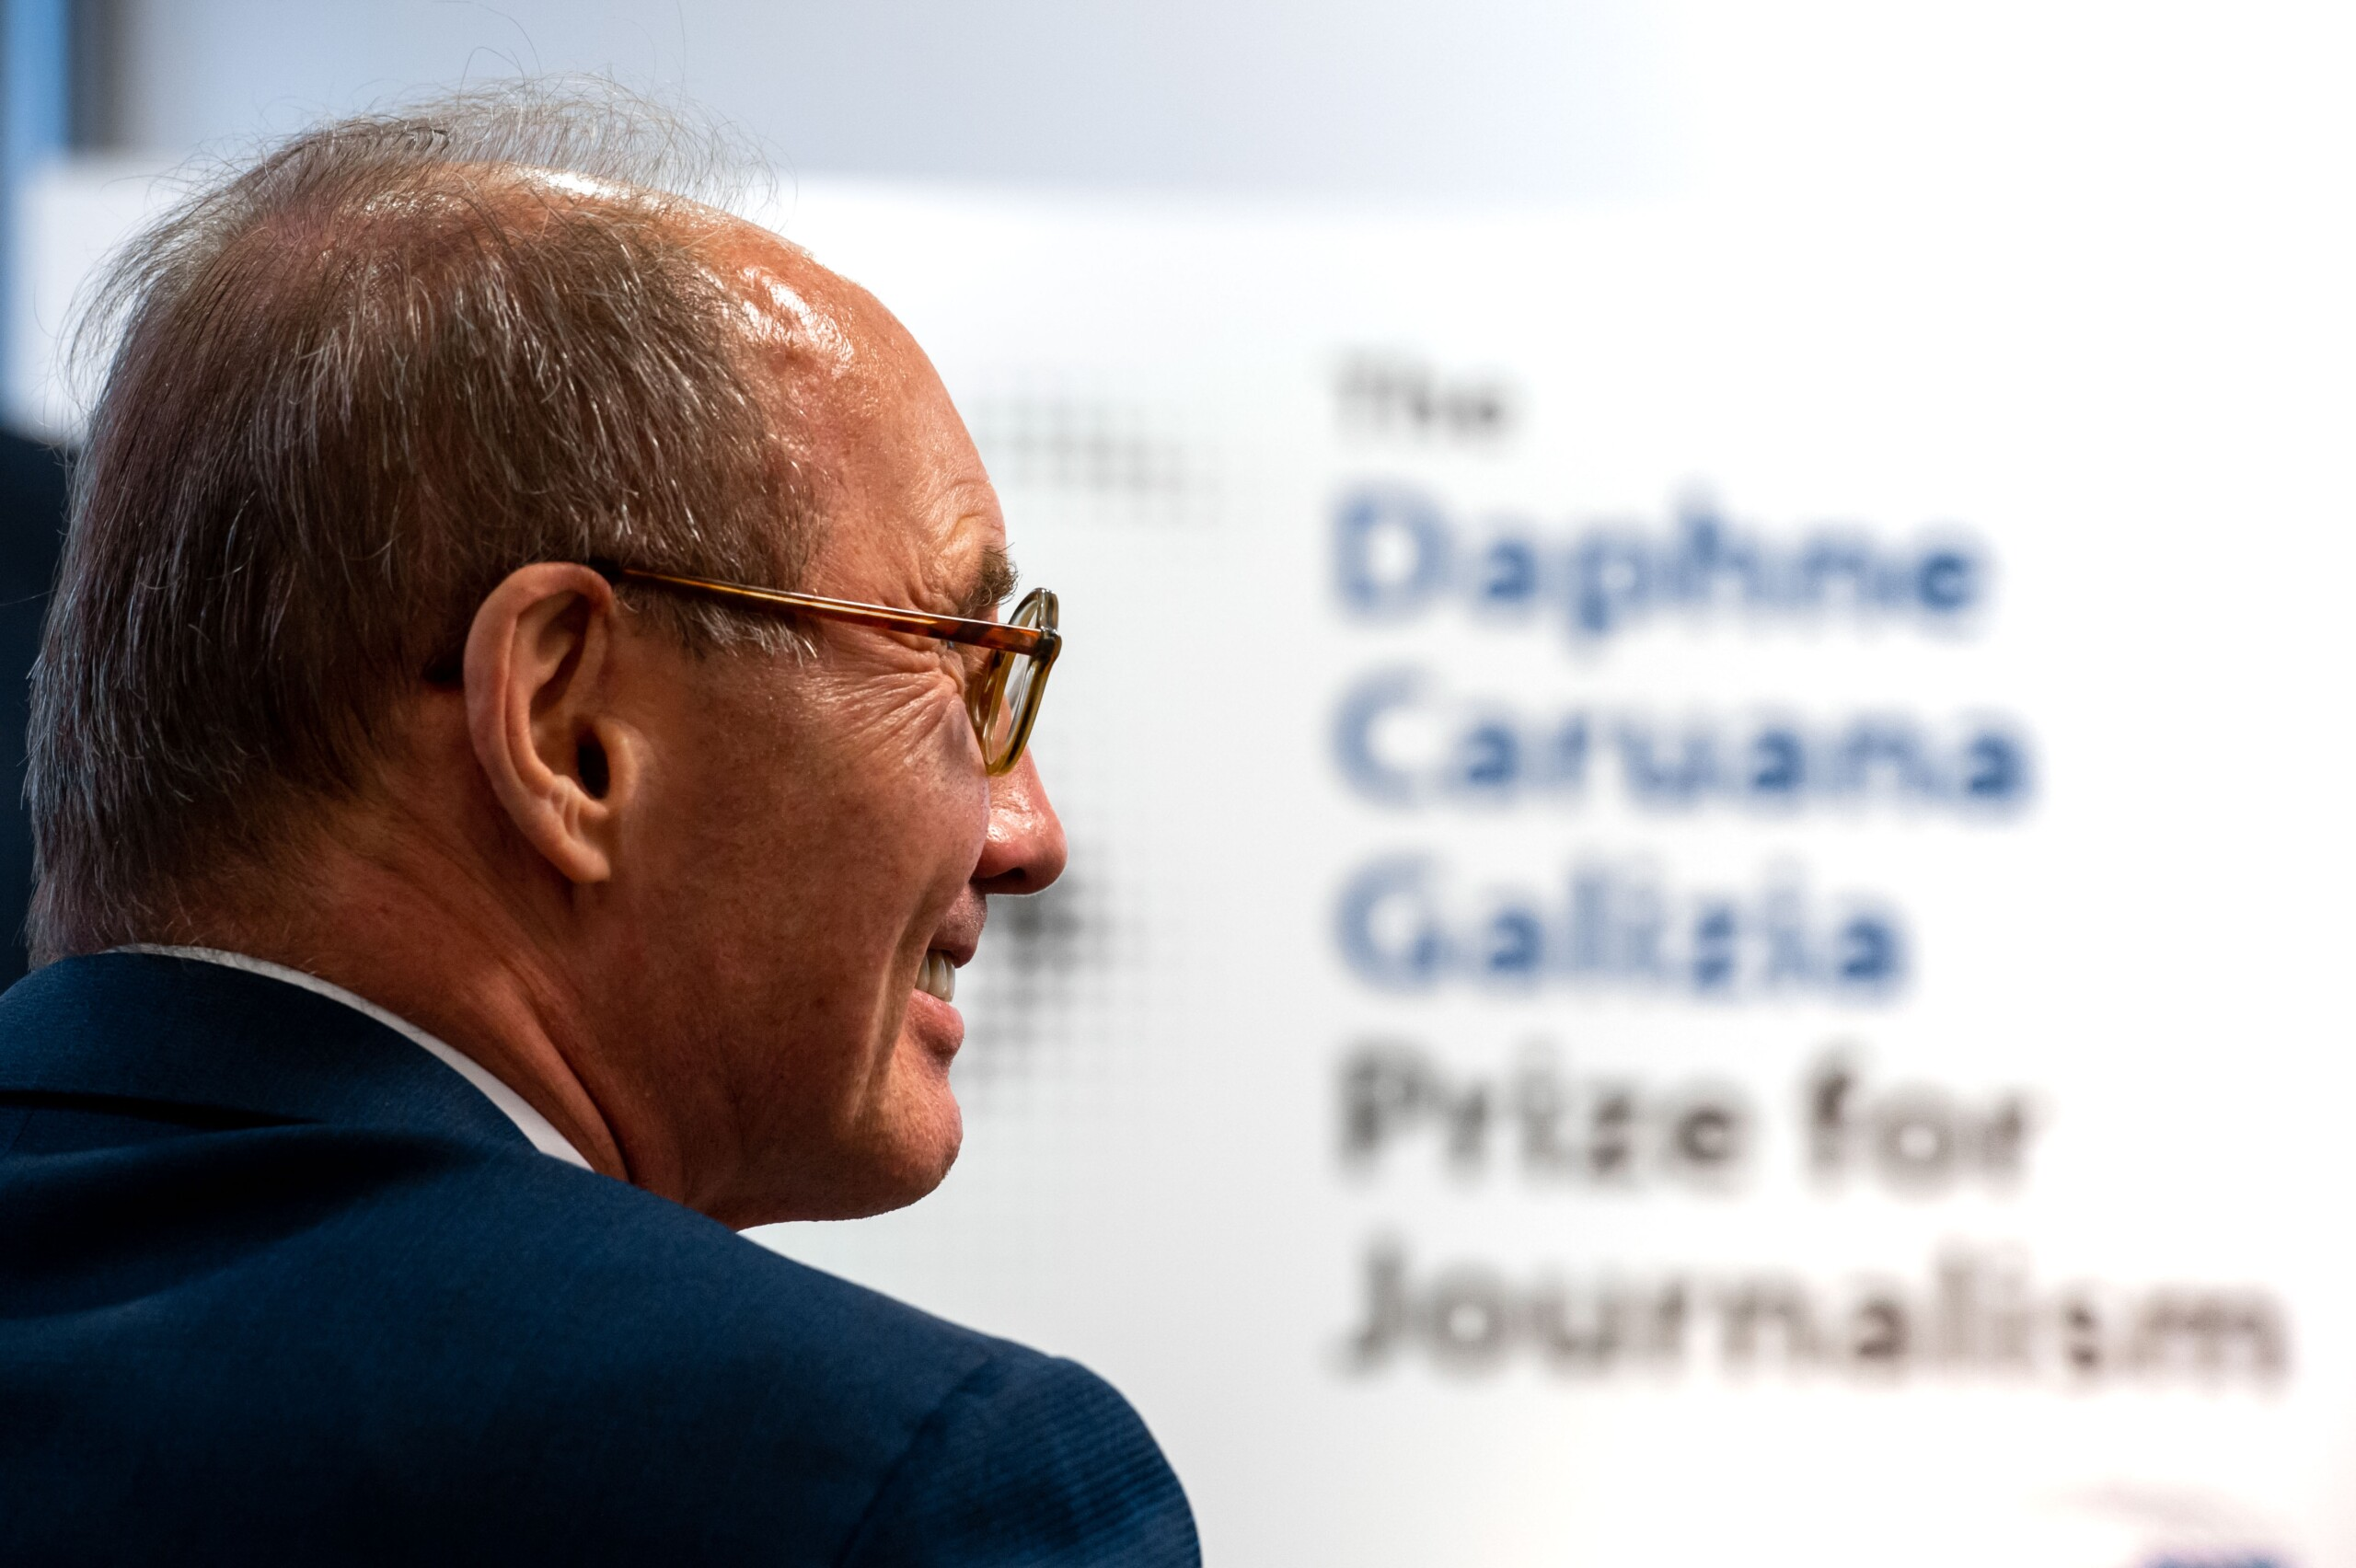 Press Conference of Daphne Caruana Galizia Prize for Journalism